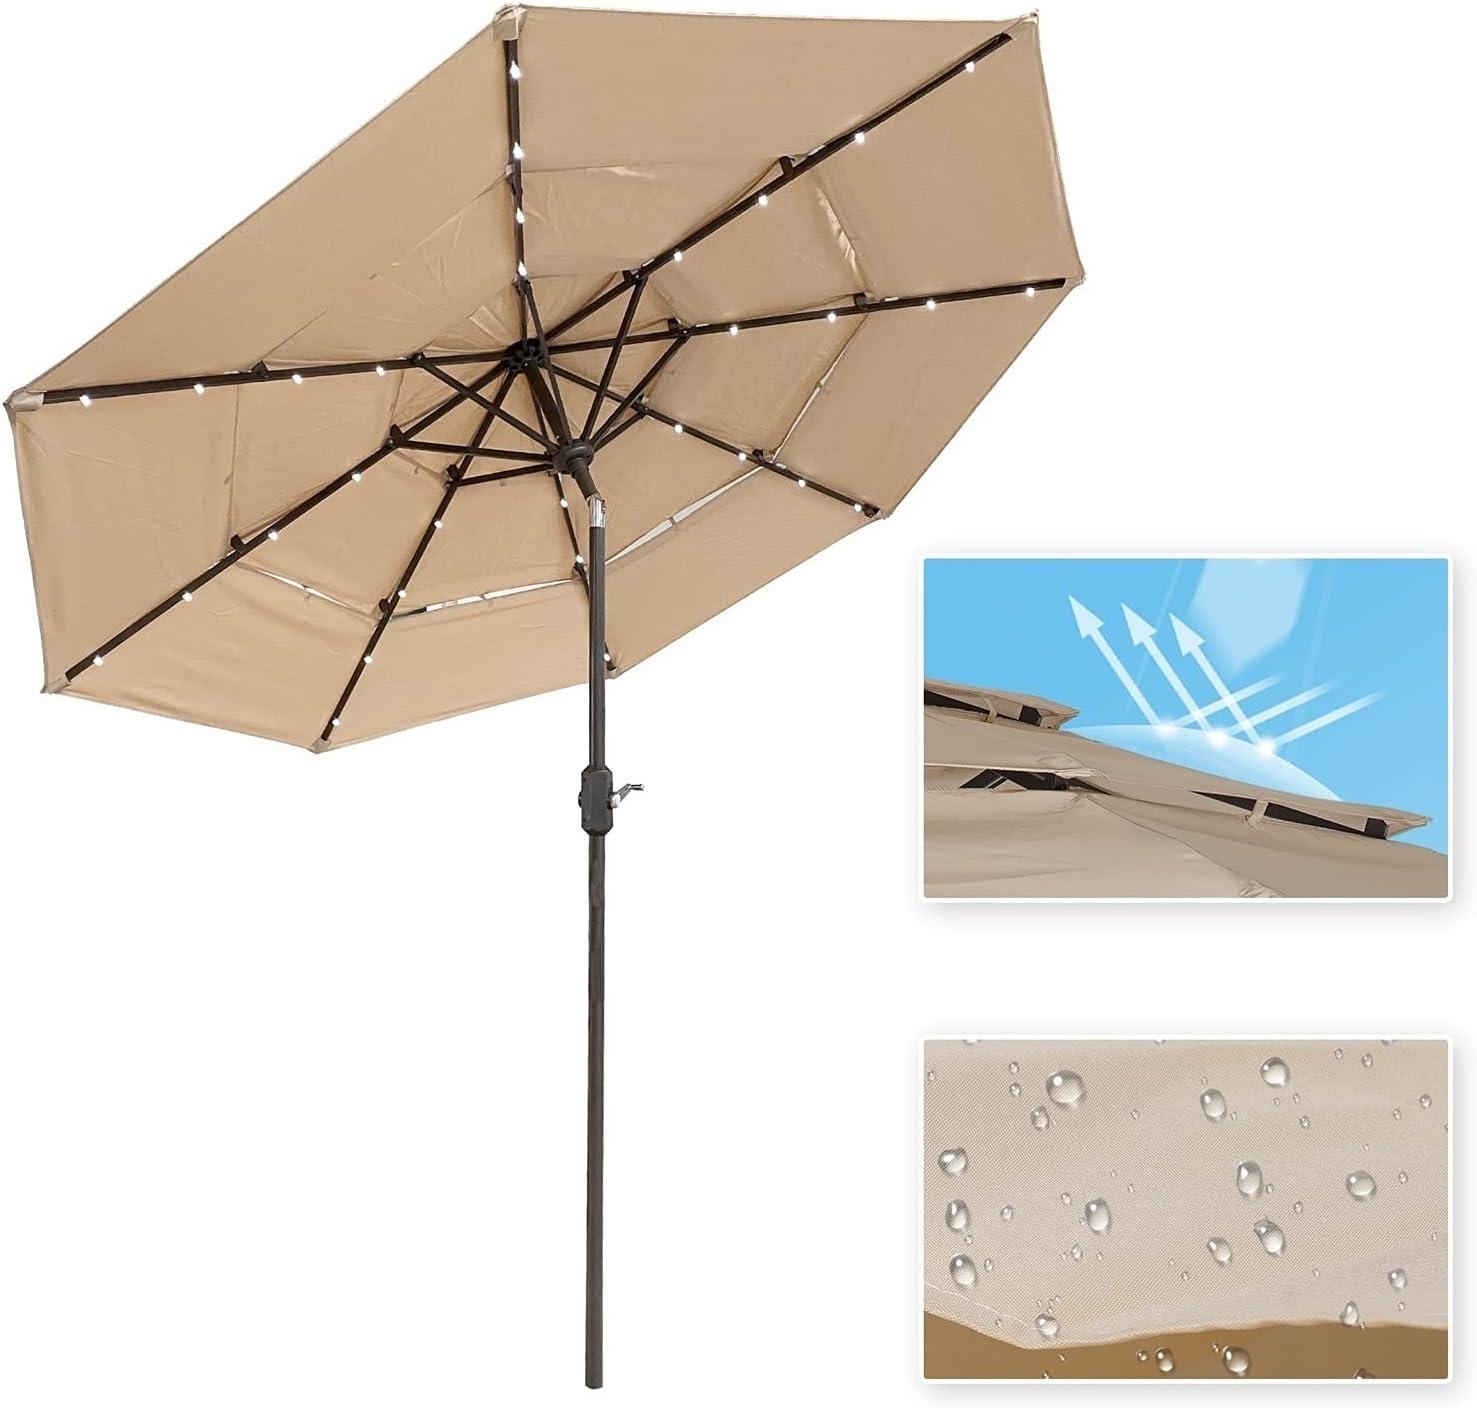 LASBAK Patio Long Beach Mall Umbrella 9 Ft 3 Tier Solar Max 57% OFF 32 Market with